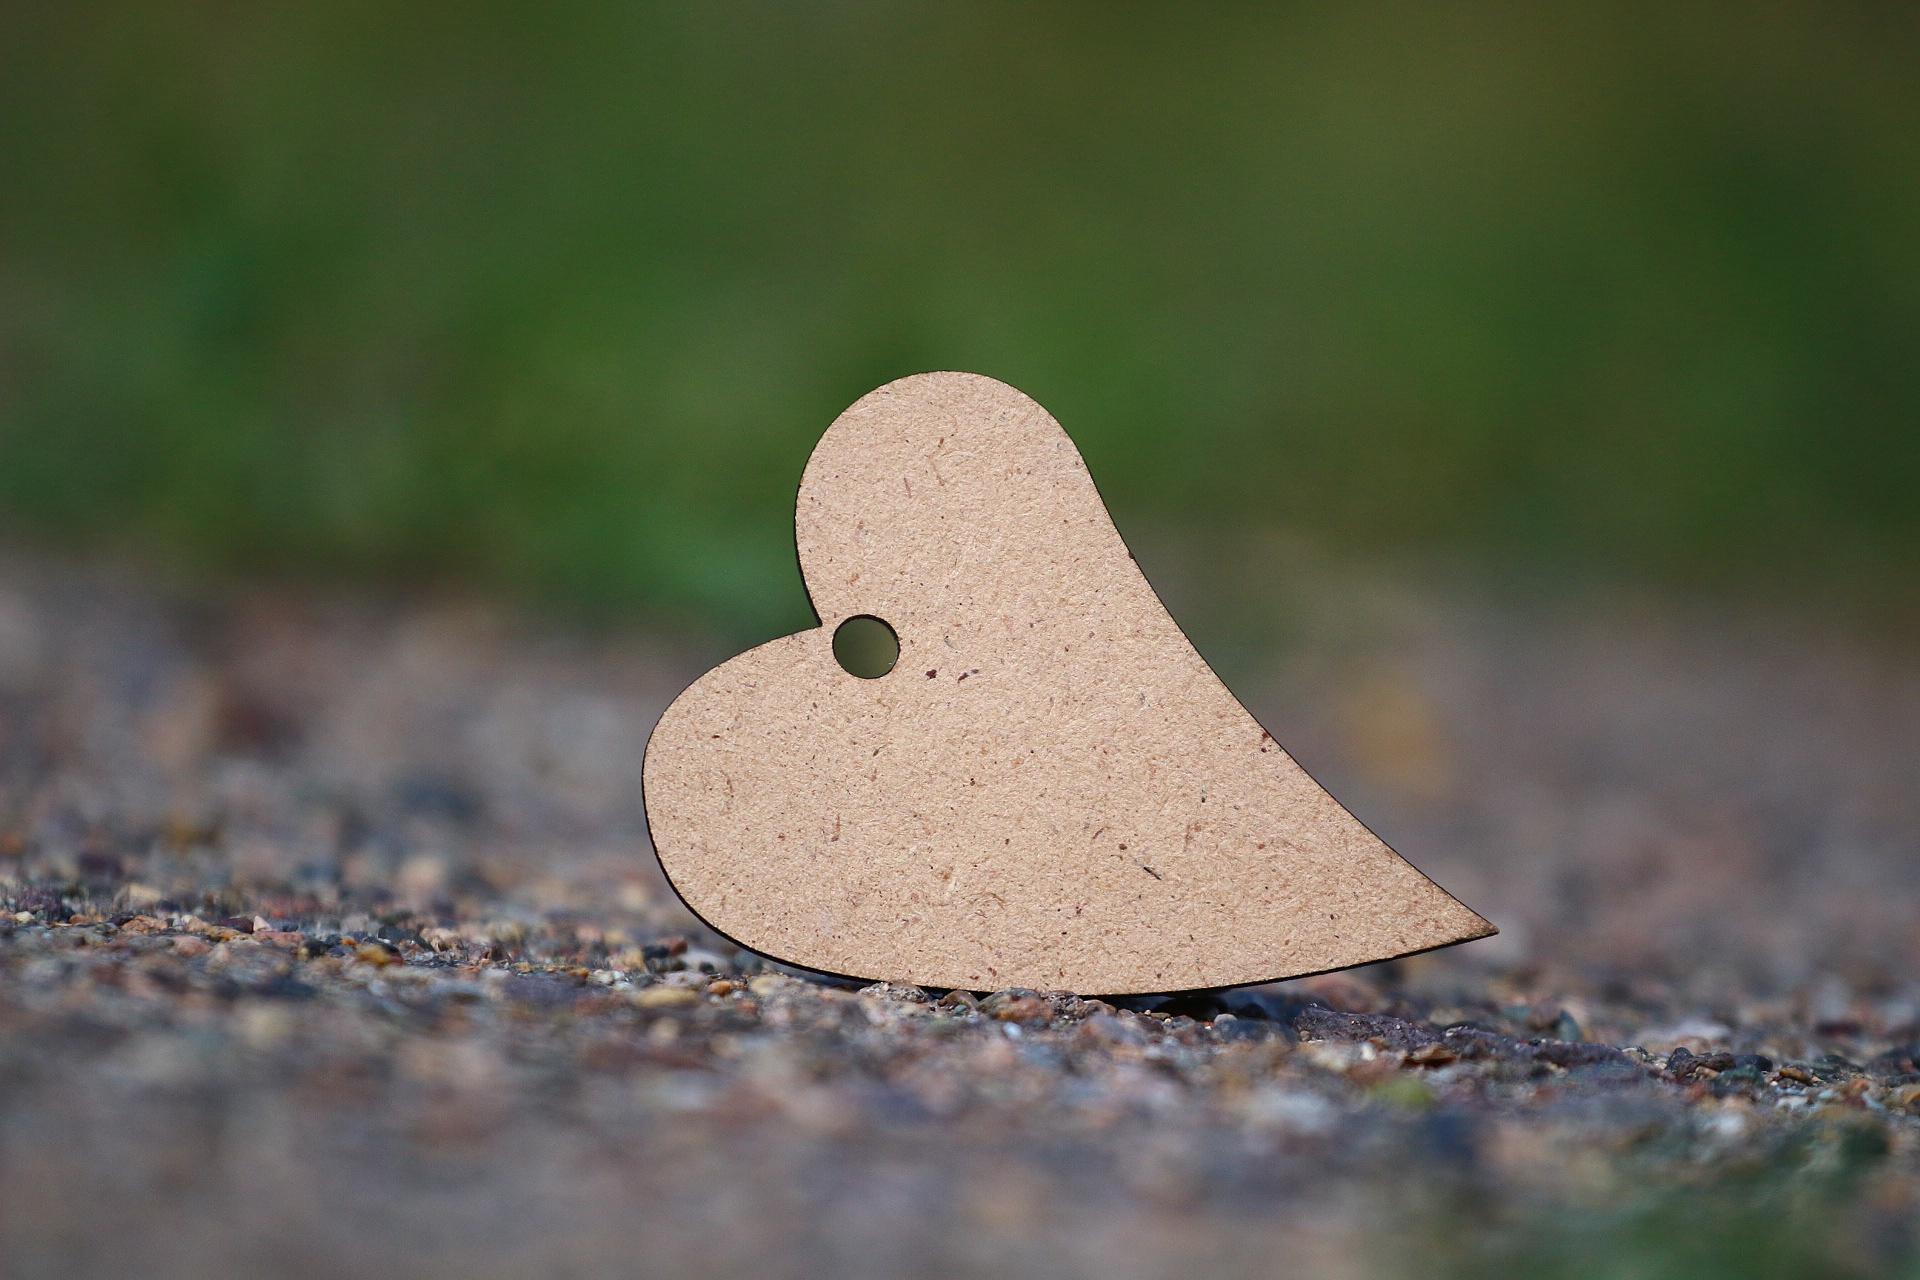 Обои сердце, шов, разбитое сердце, рисунок. Разное foto 15